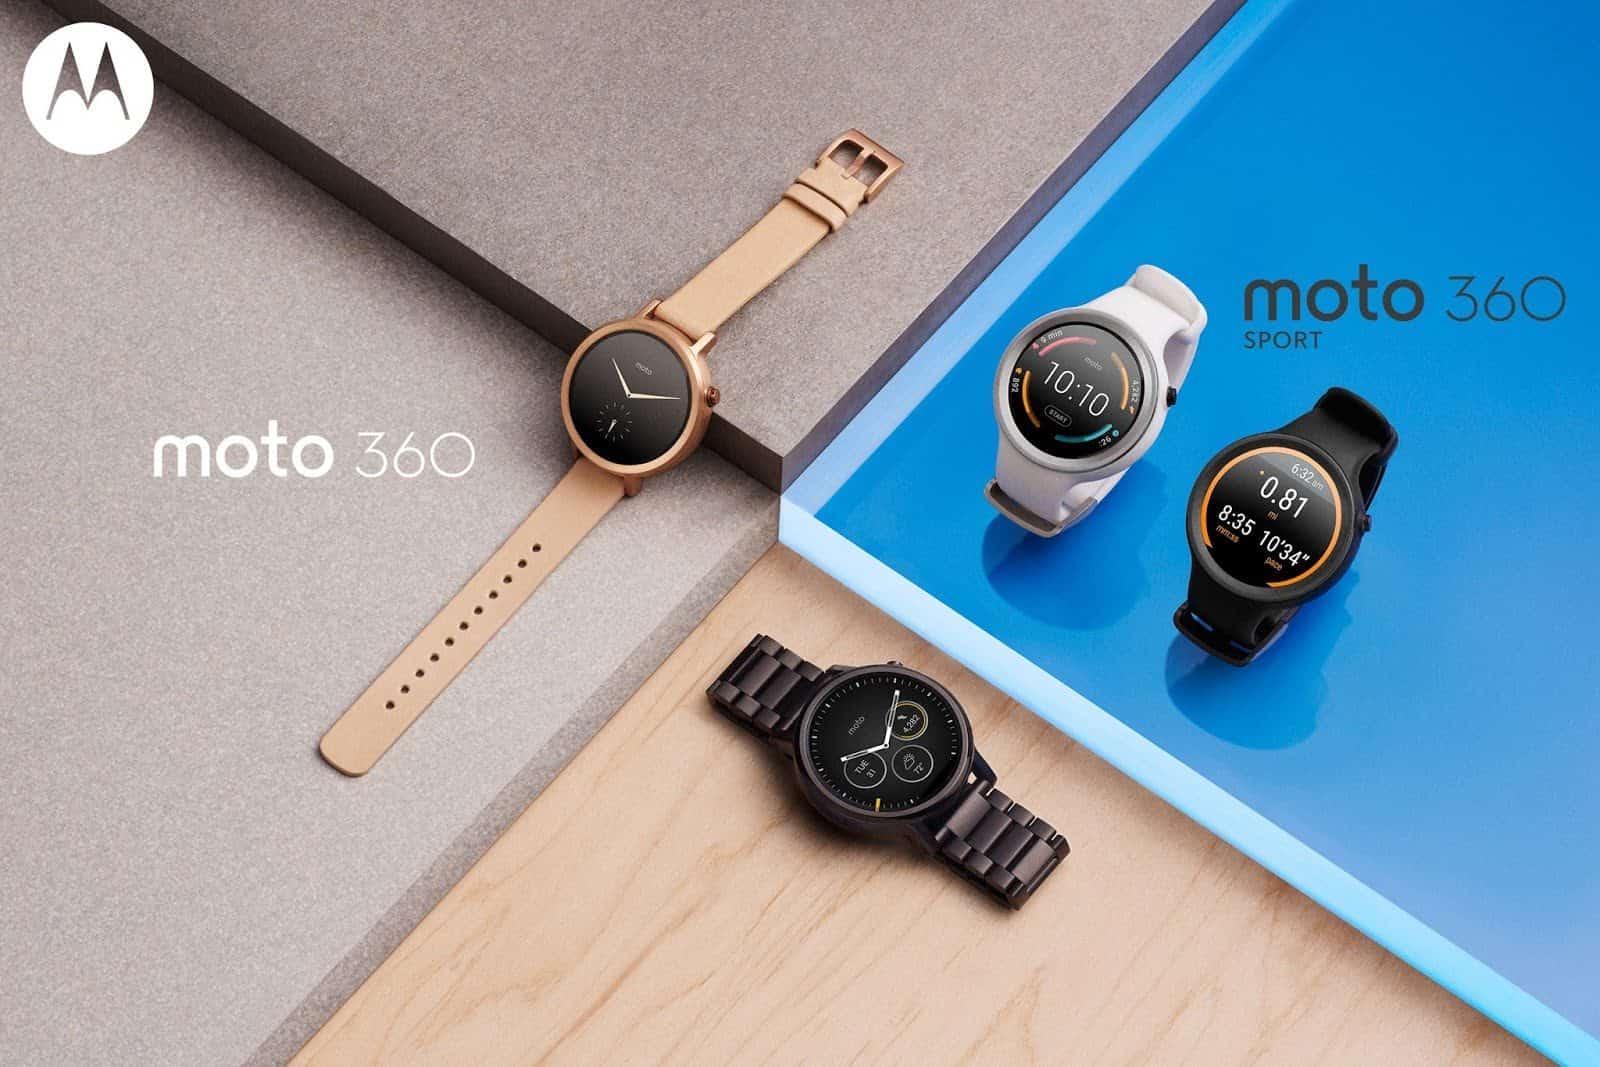 Moto 360 2nd Gen press image